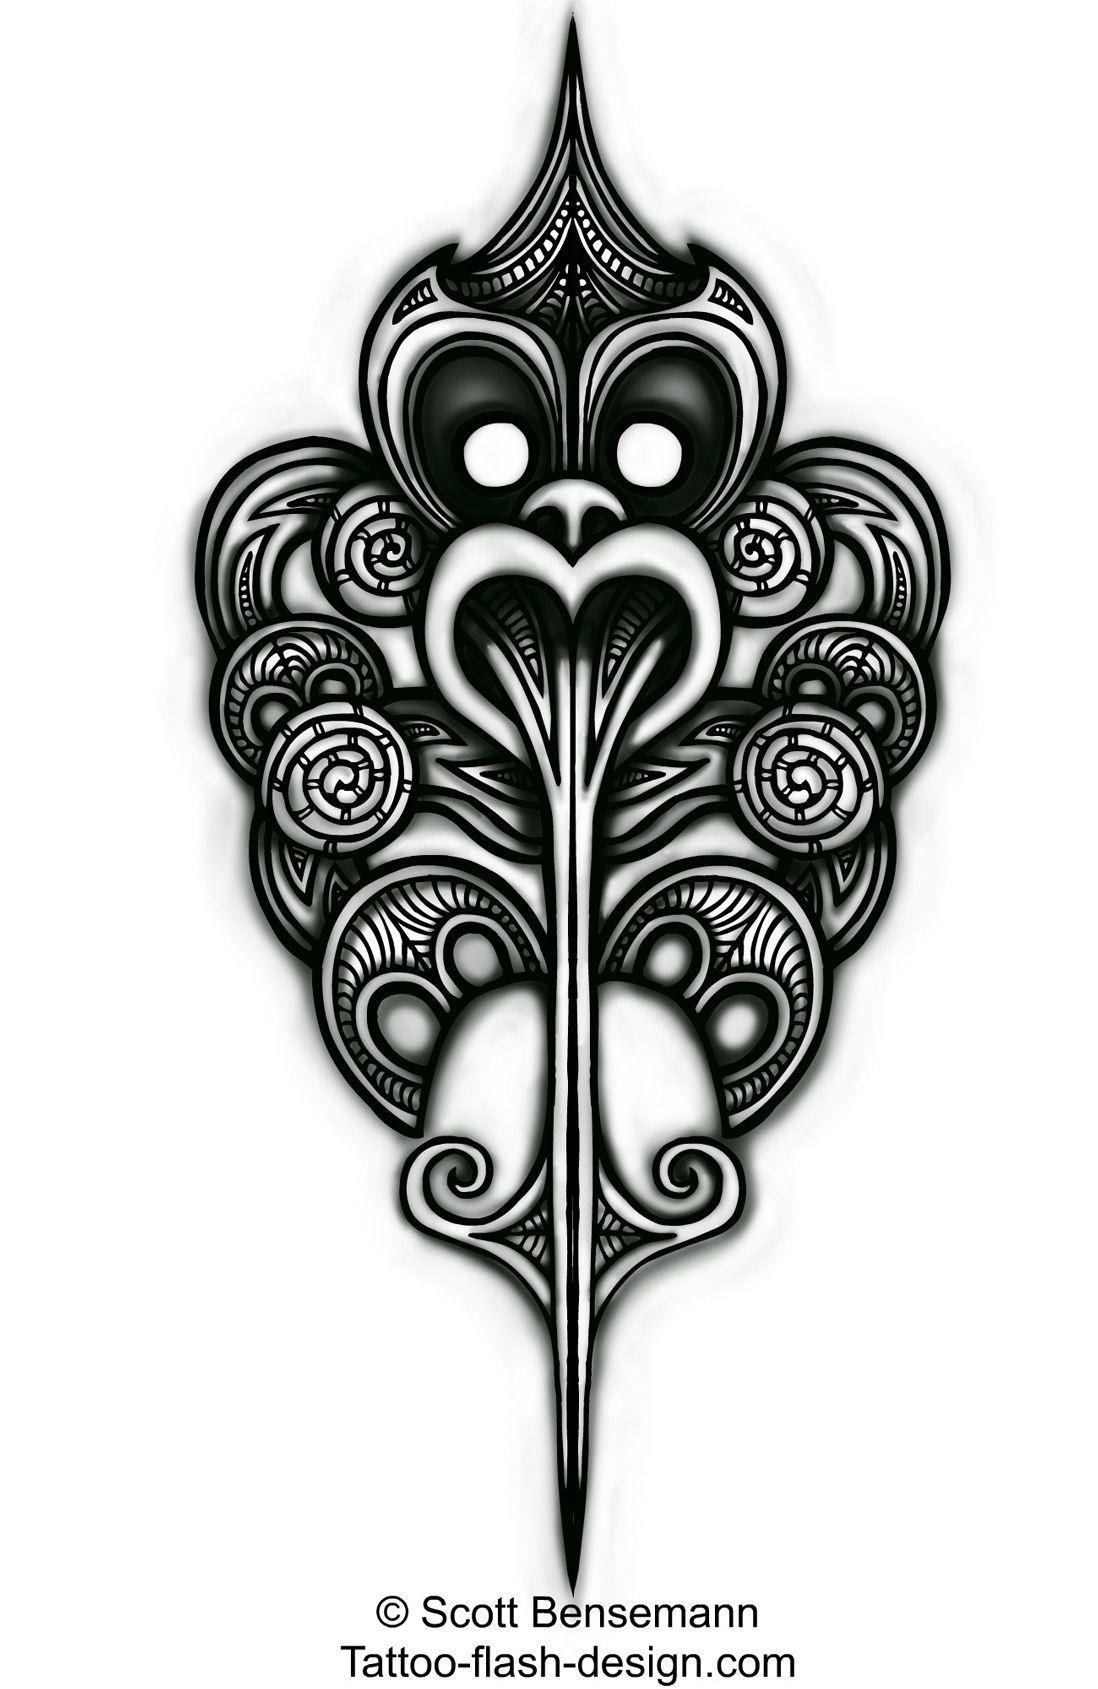 Yin yang tattoo maori pesquisa google idée tatouage pinterest